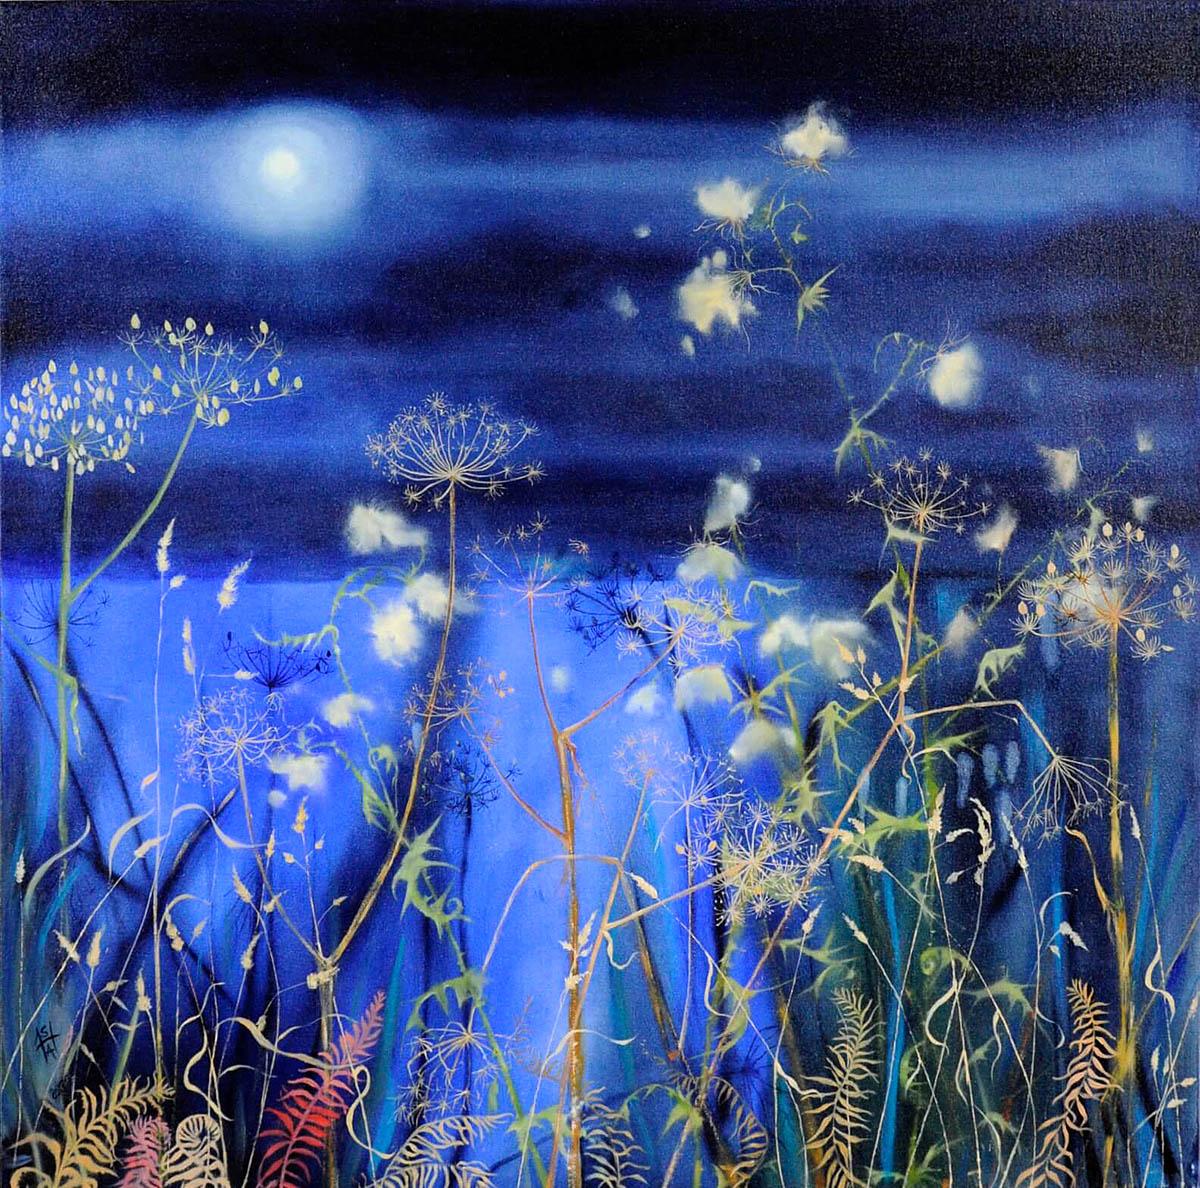 Sheila Anderson Hardy, 'Loch Moon', oil on canvas